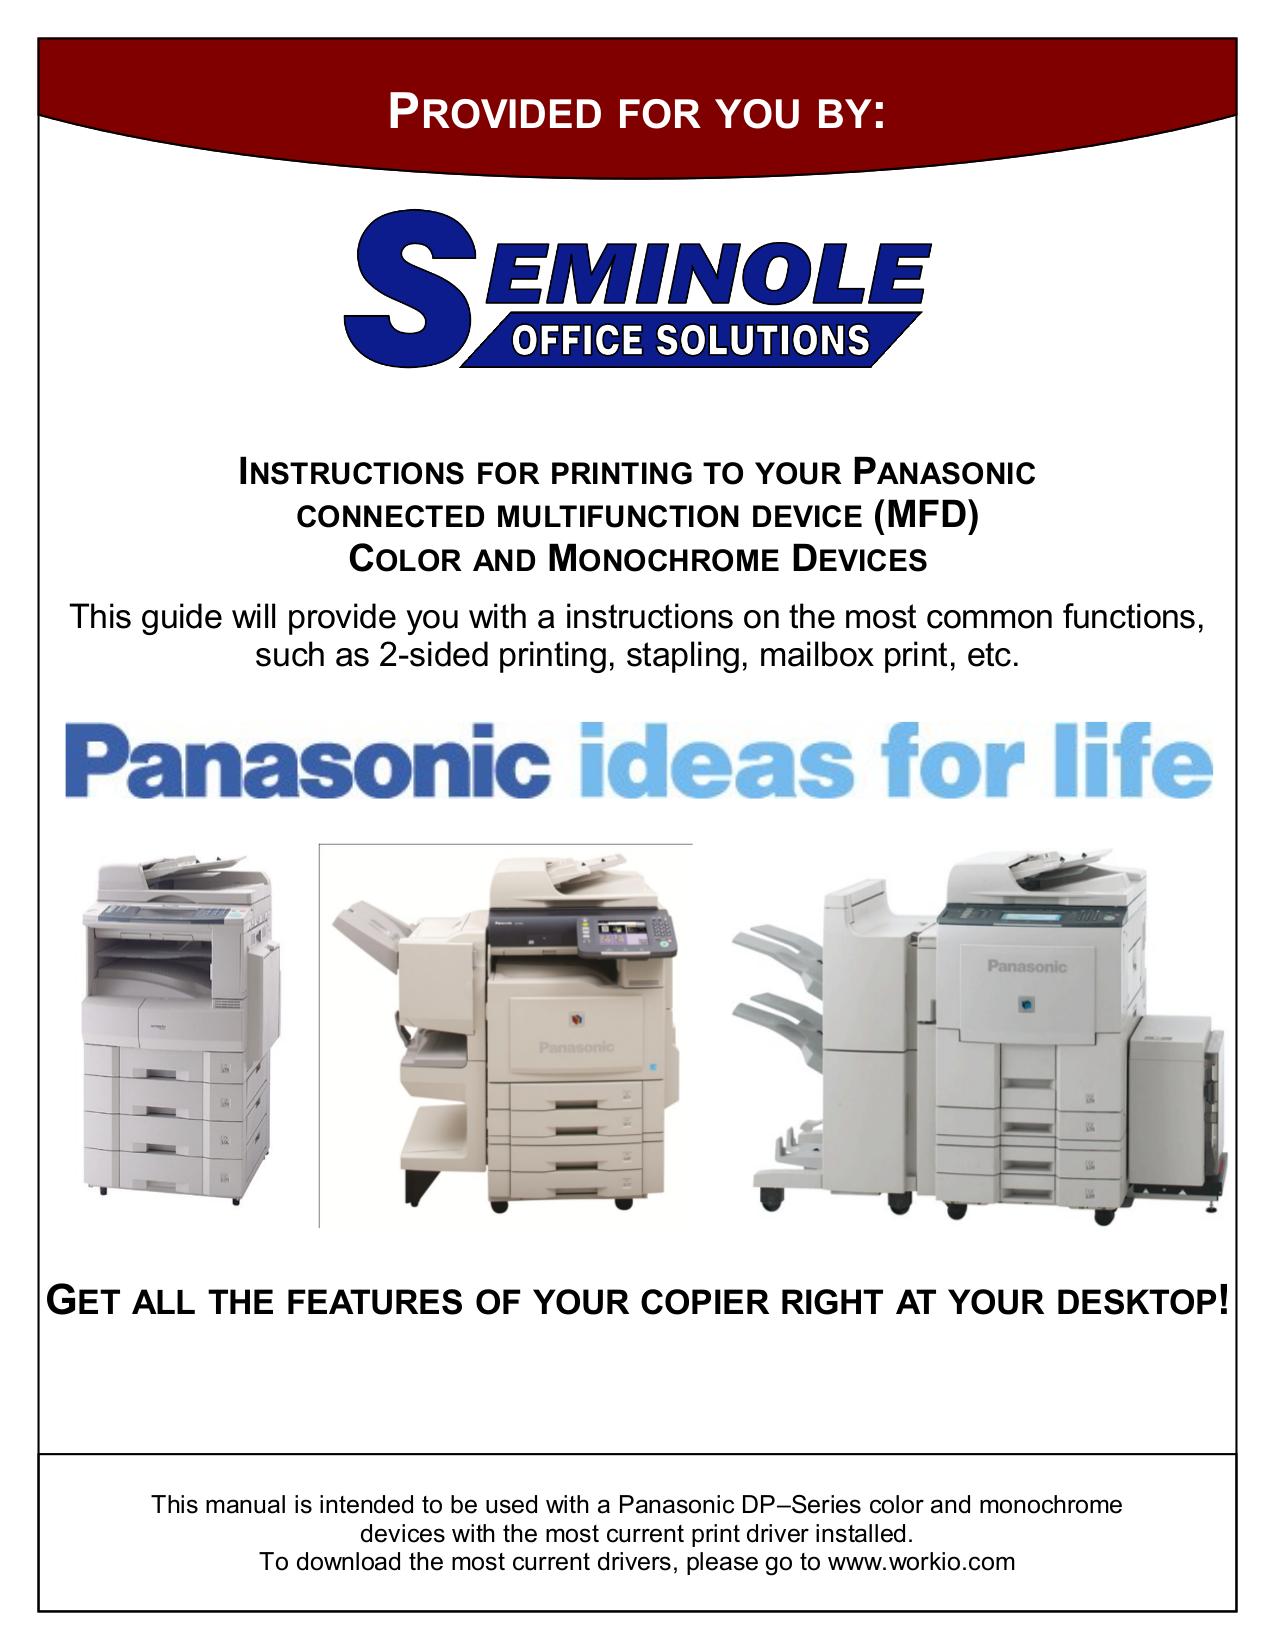 download free pdf for panasonic workio dp 8060 copier manual rh umlib com Panasonic Copier Drivers Panasonic Copier Drivers